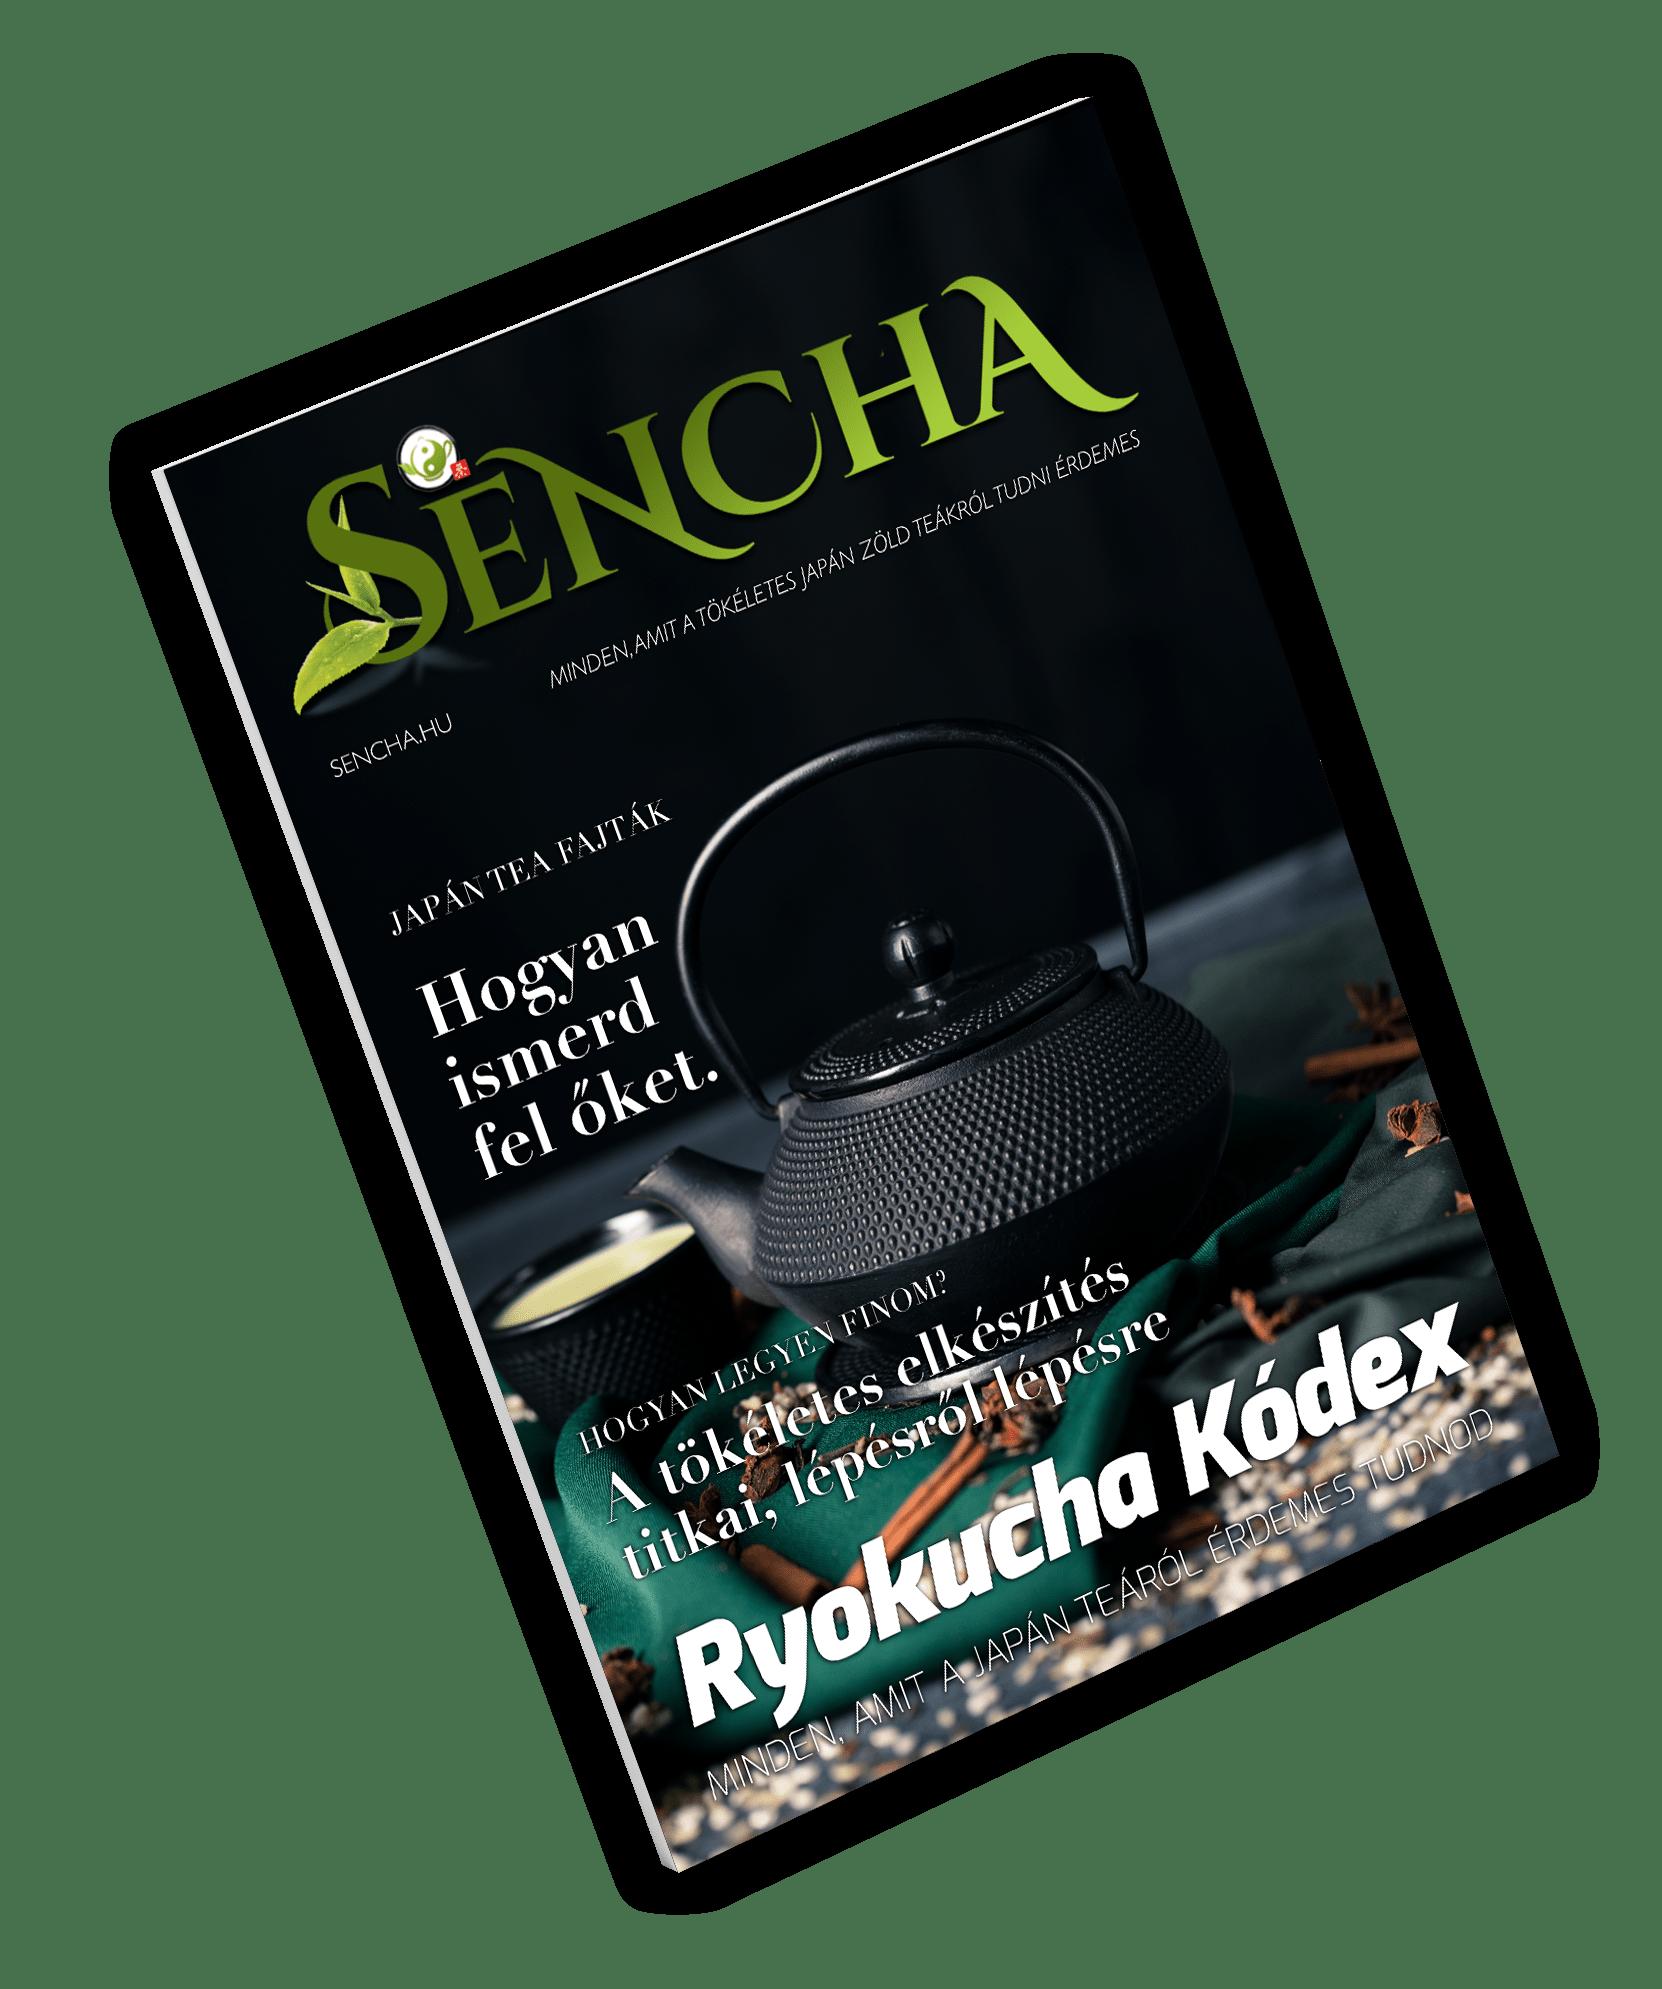 https://5elemteai.hu/wp-content/uploads/2021/07/sencha_kodex_nyers.png